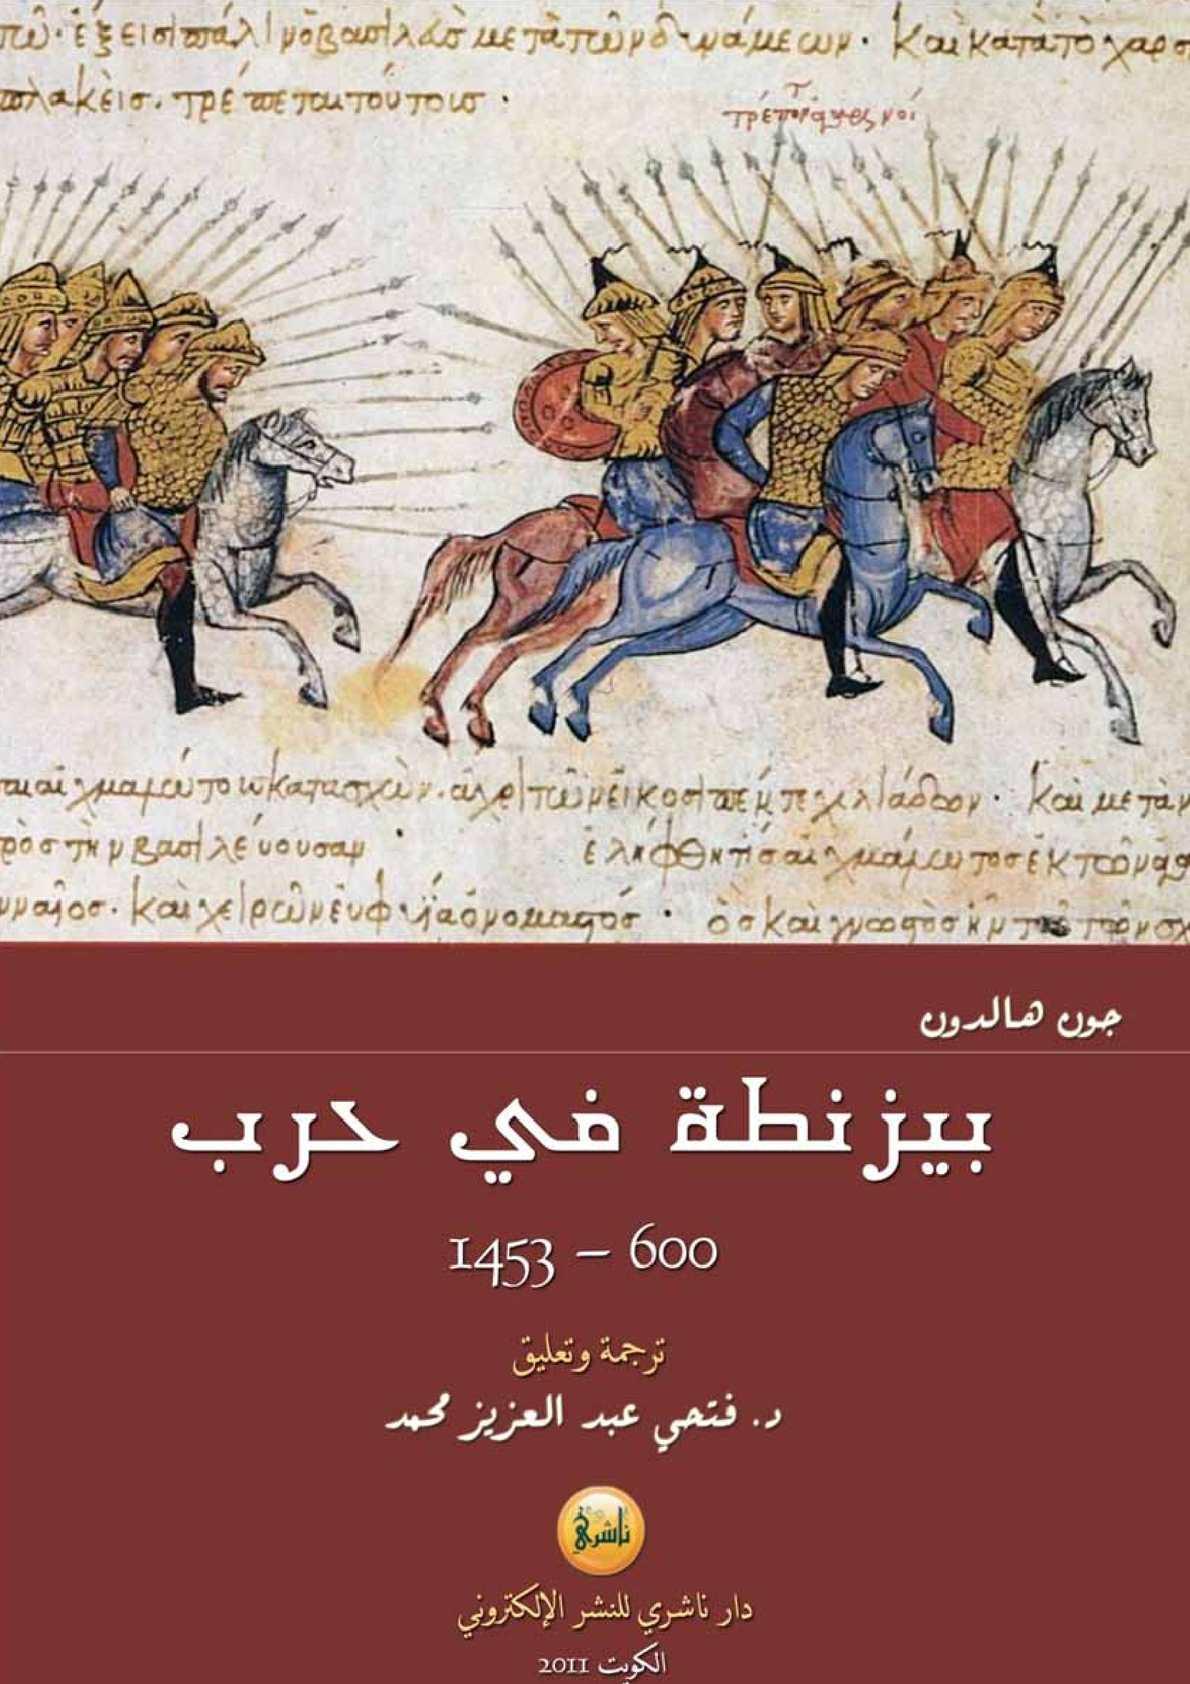 بيزنطة في حرب 600-1453